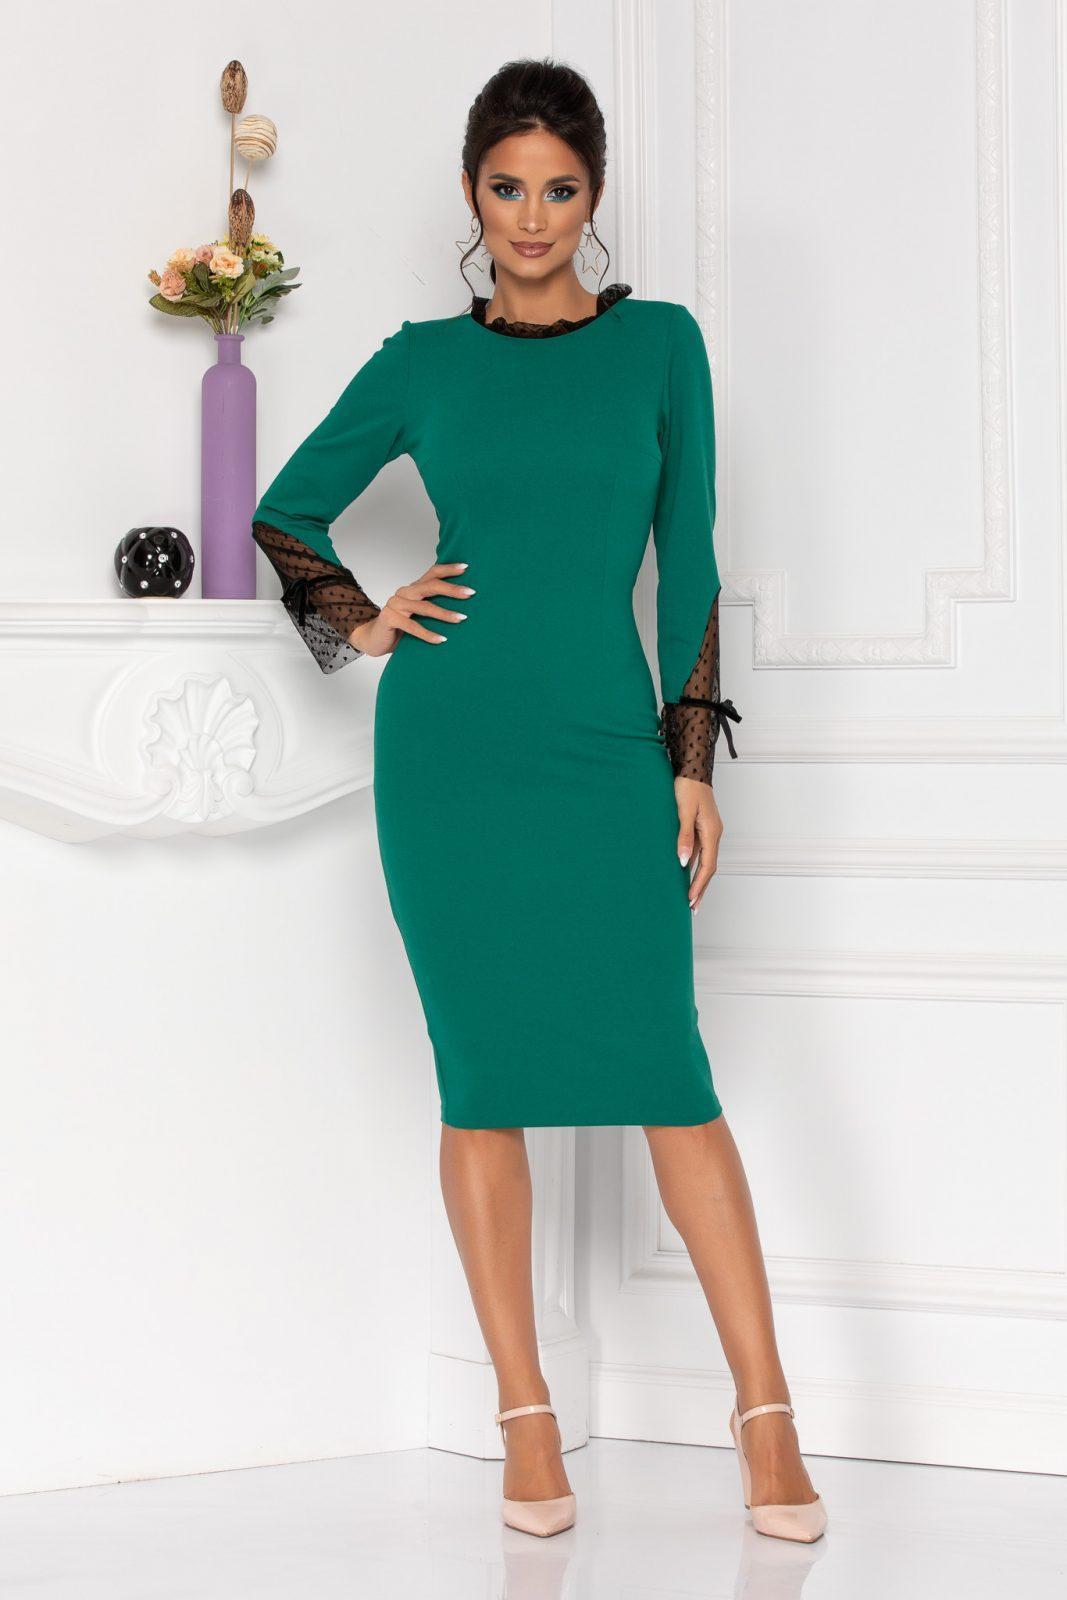 Moze Dalia Green Dress